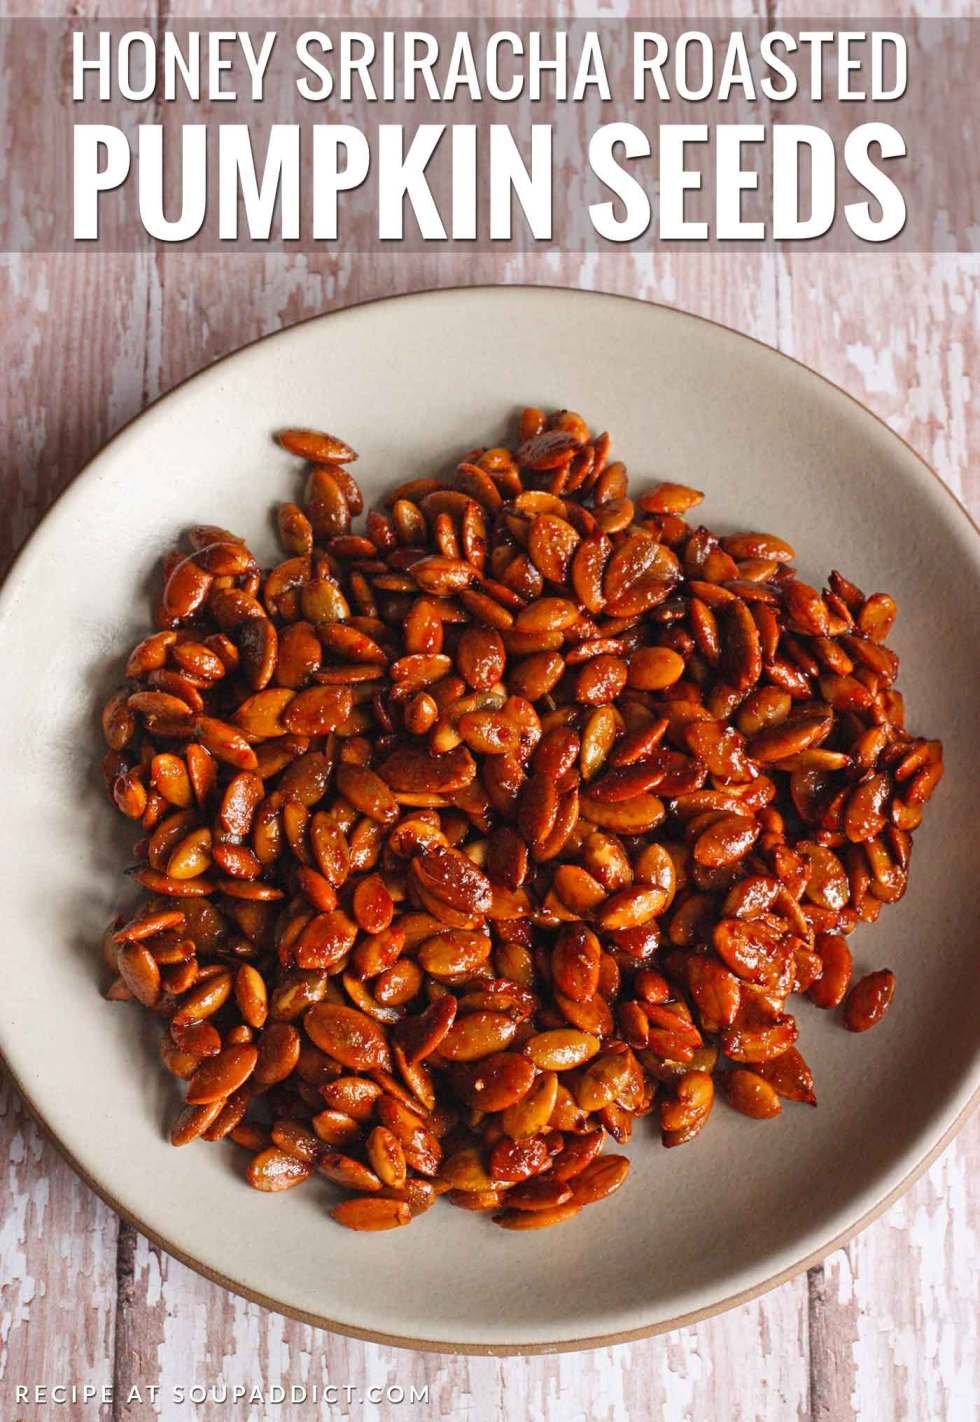 Honey Sriracha Roasted Pumpkin Seeds | SoupAddict.com